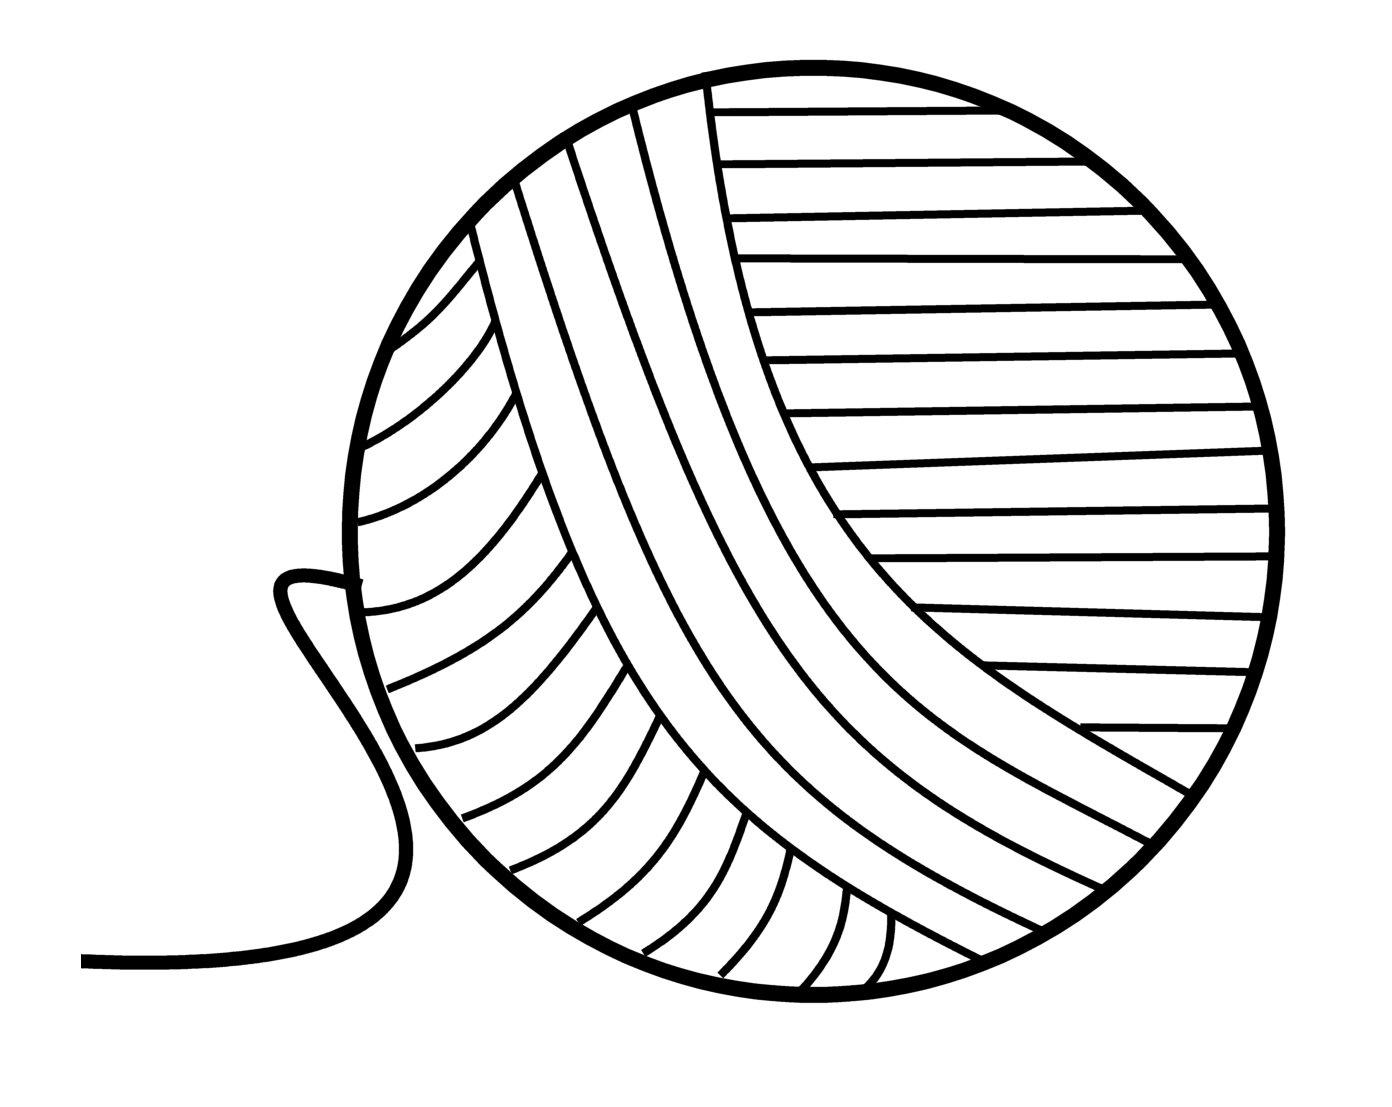 1392x1107 Ball Of Yarn Drawing Drawn Ball Yarn